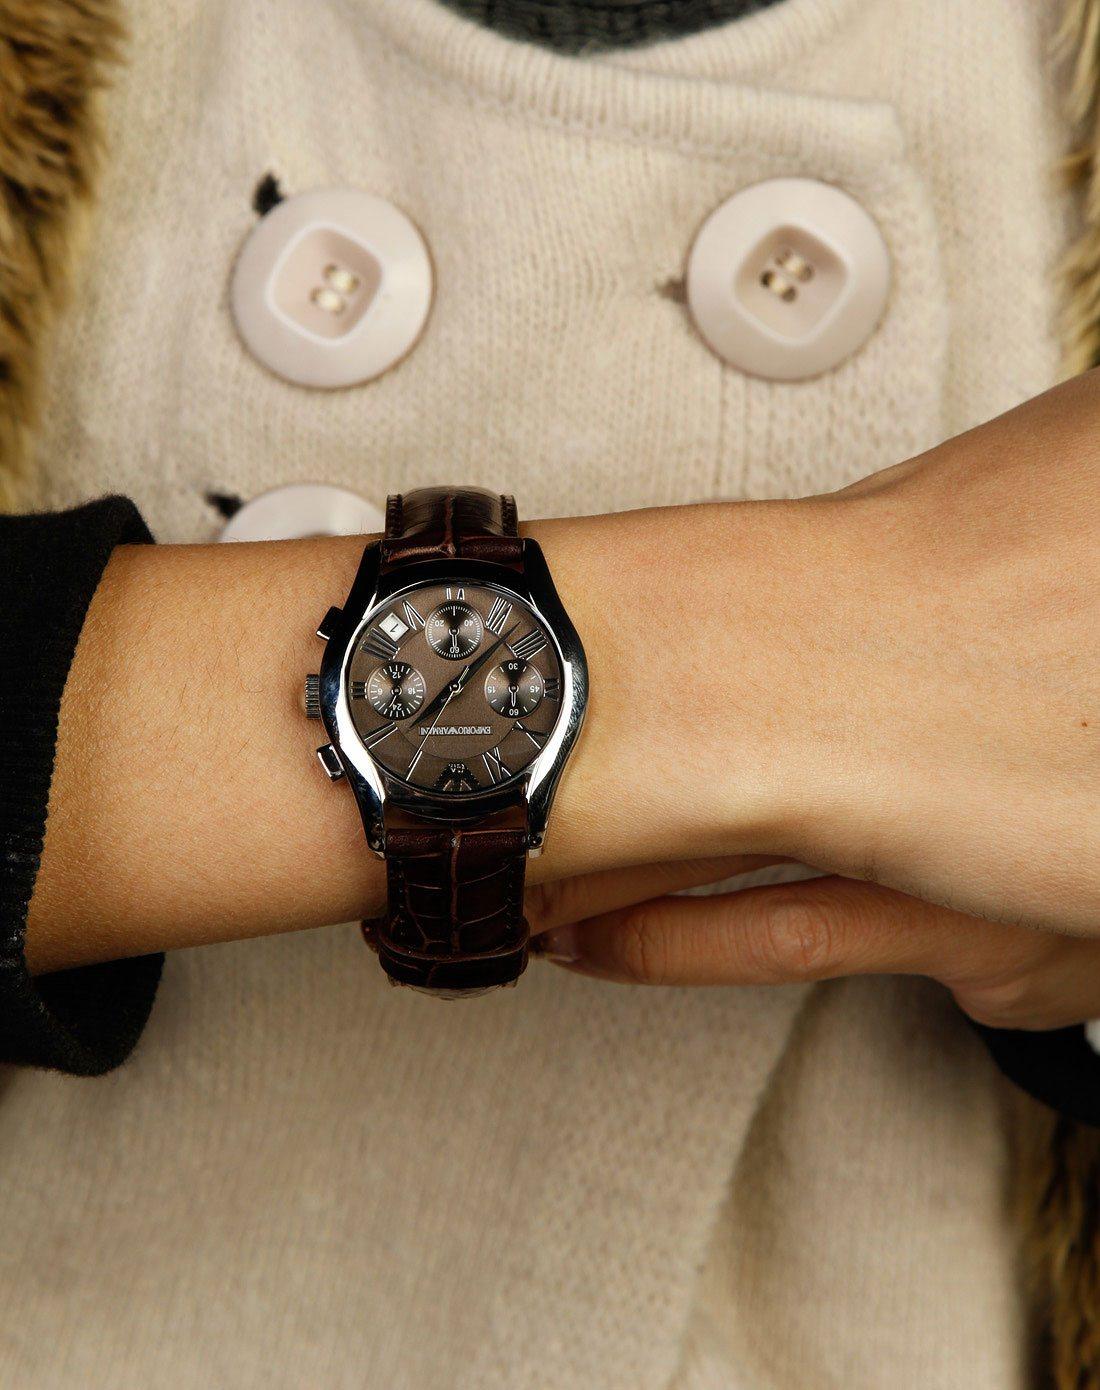 Đồng hồ đeo tay nữ Armani AR0672 Emporio sang trảnh